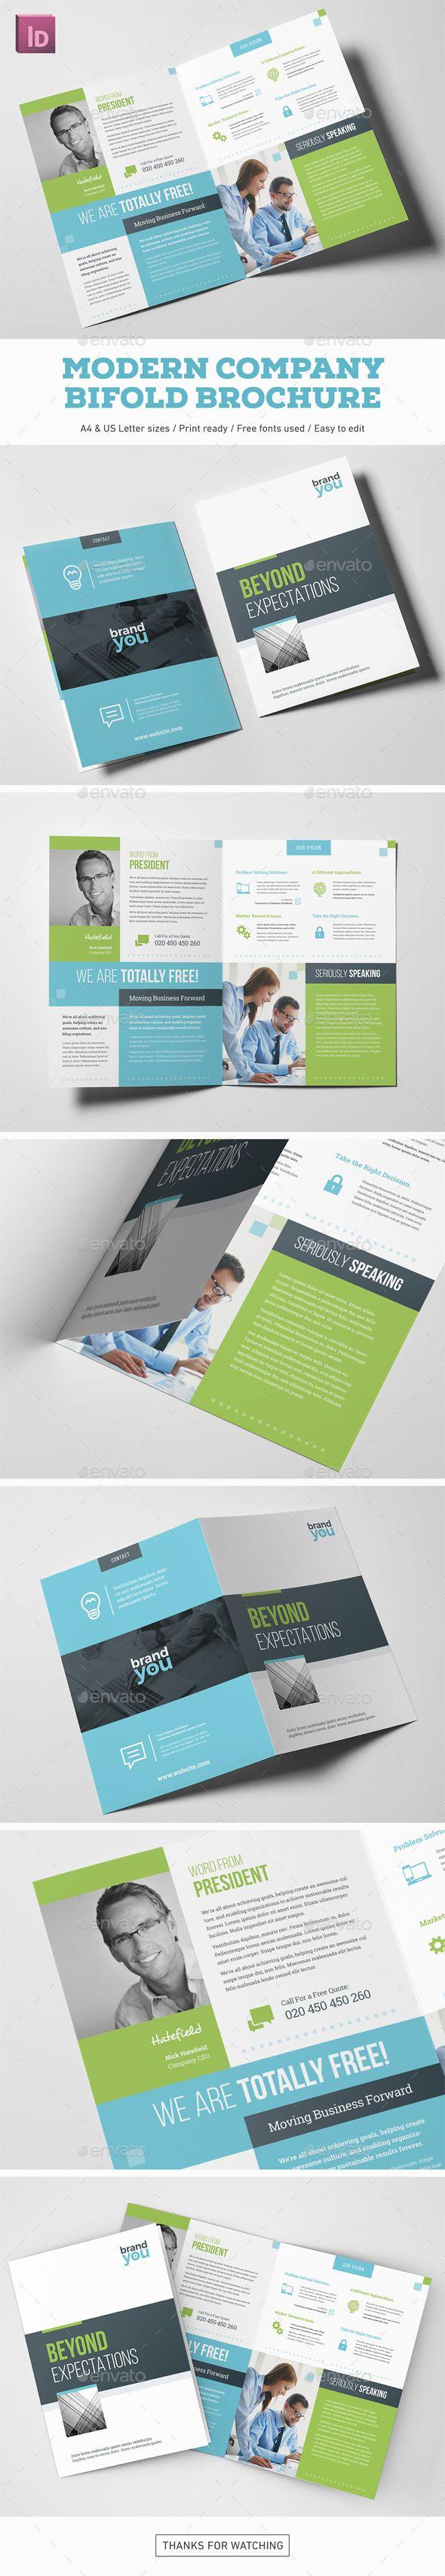 Modern Company Bifold Brochure